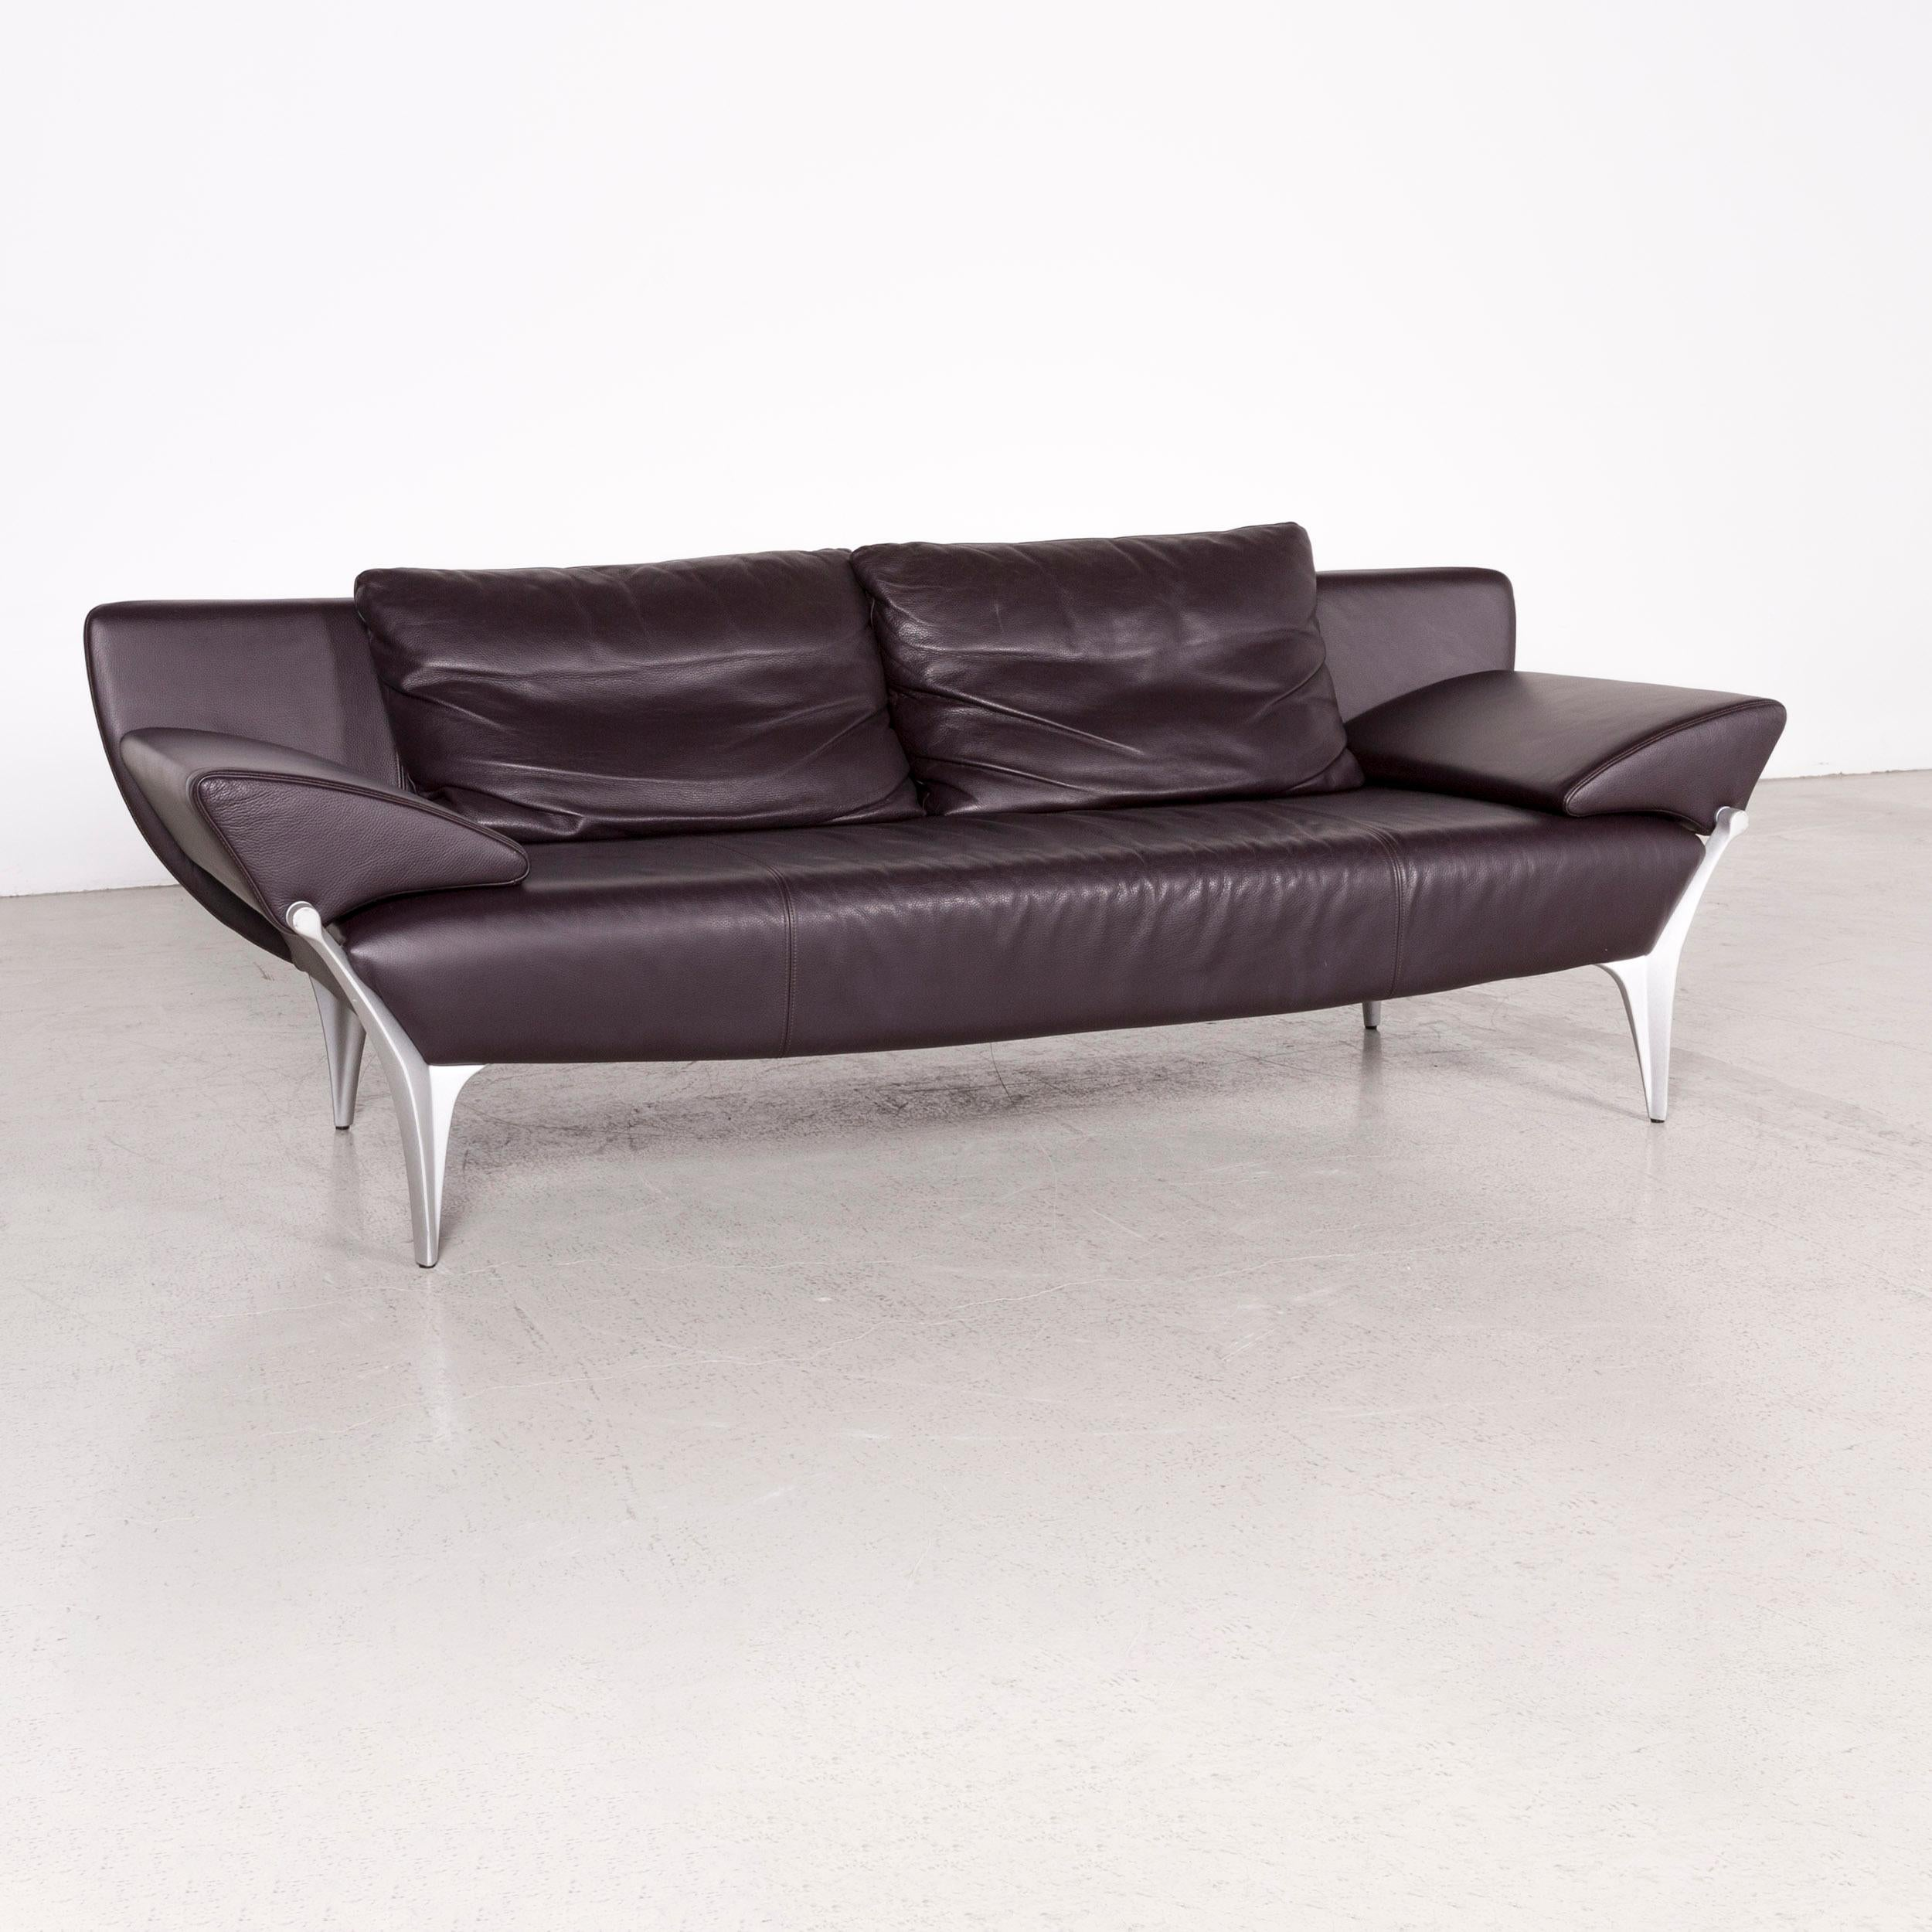 Rolf Benz 1600 Designer Leather Sofa Aubergine Genuine Leather Three Seat